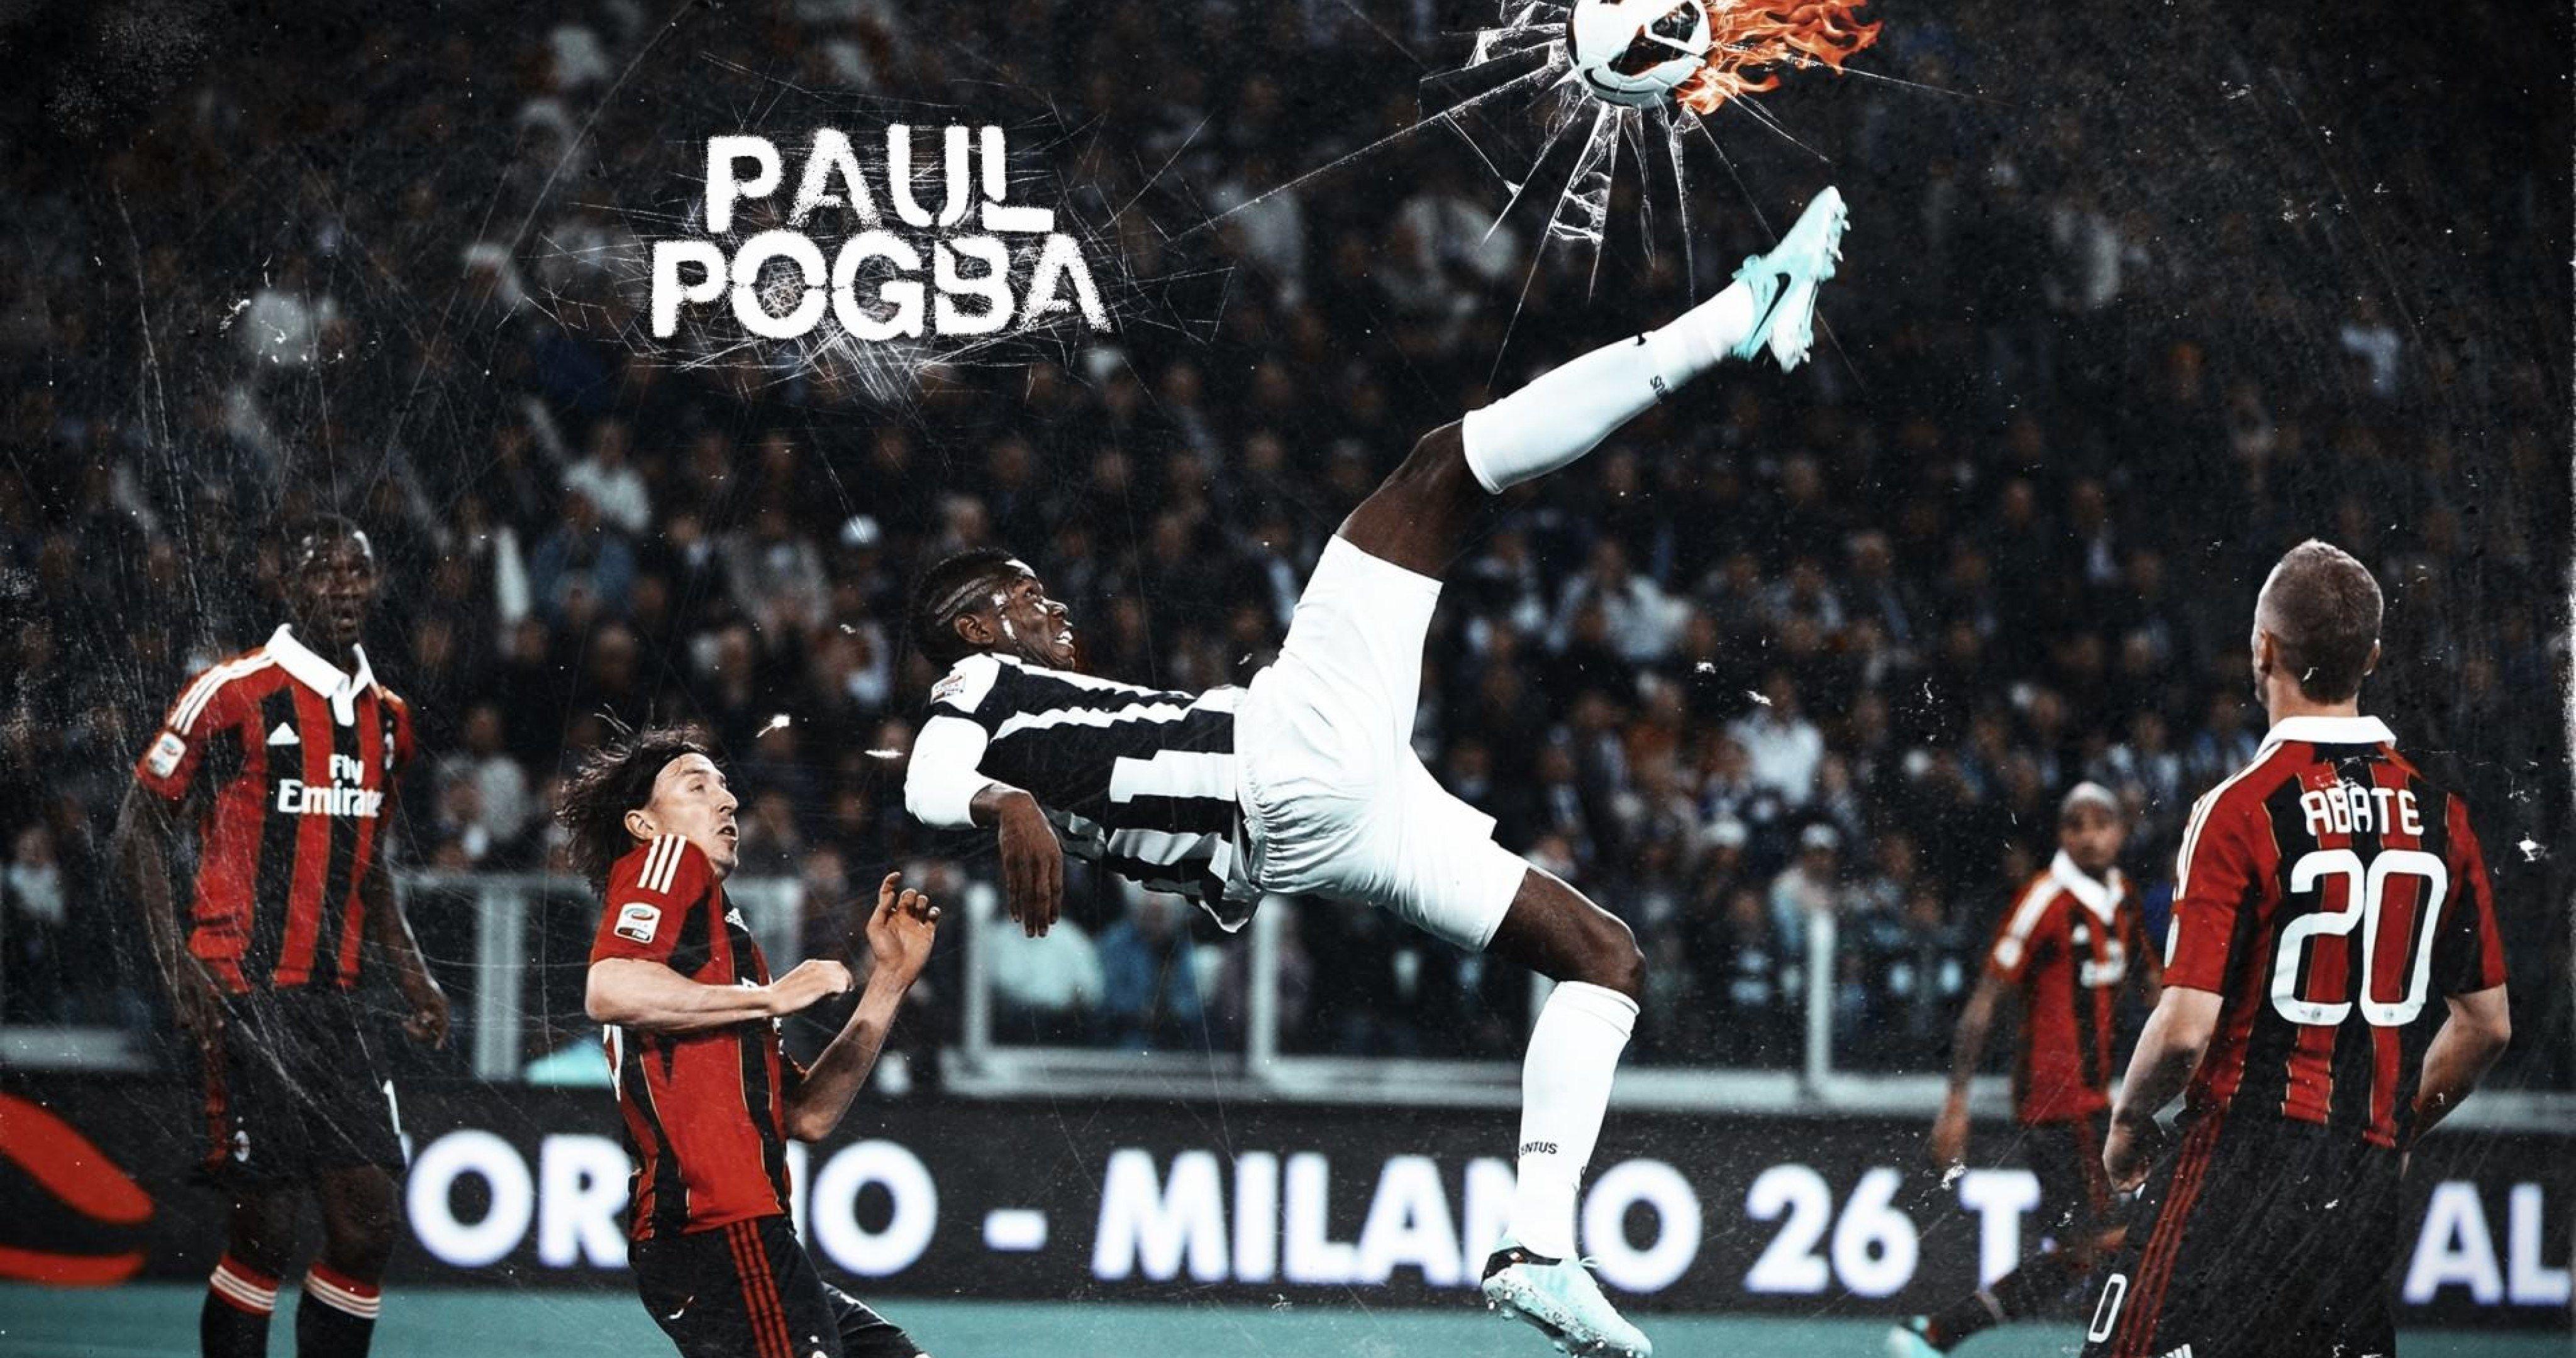 Paul Drogba 4k Ultra Hd Wallpaper Paul Labile Pogba Paul Pogba